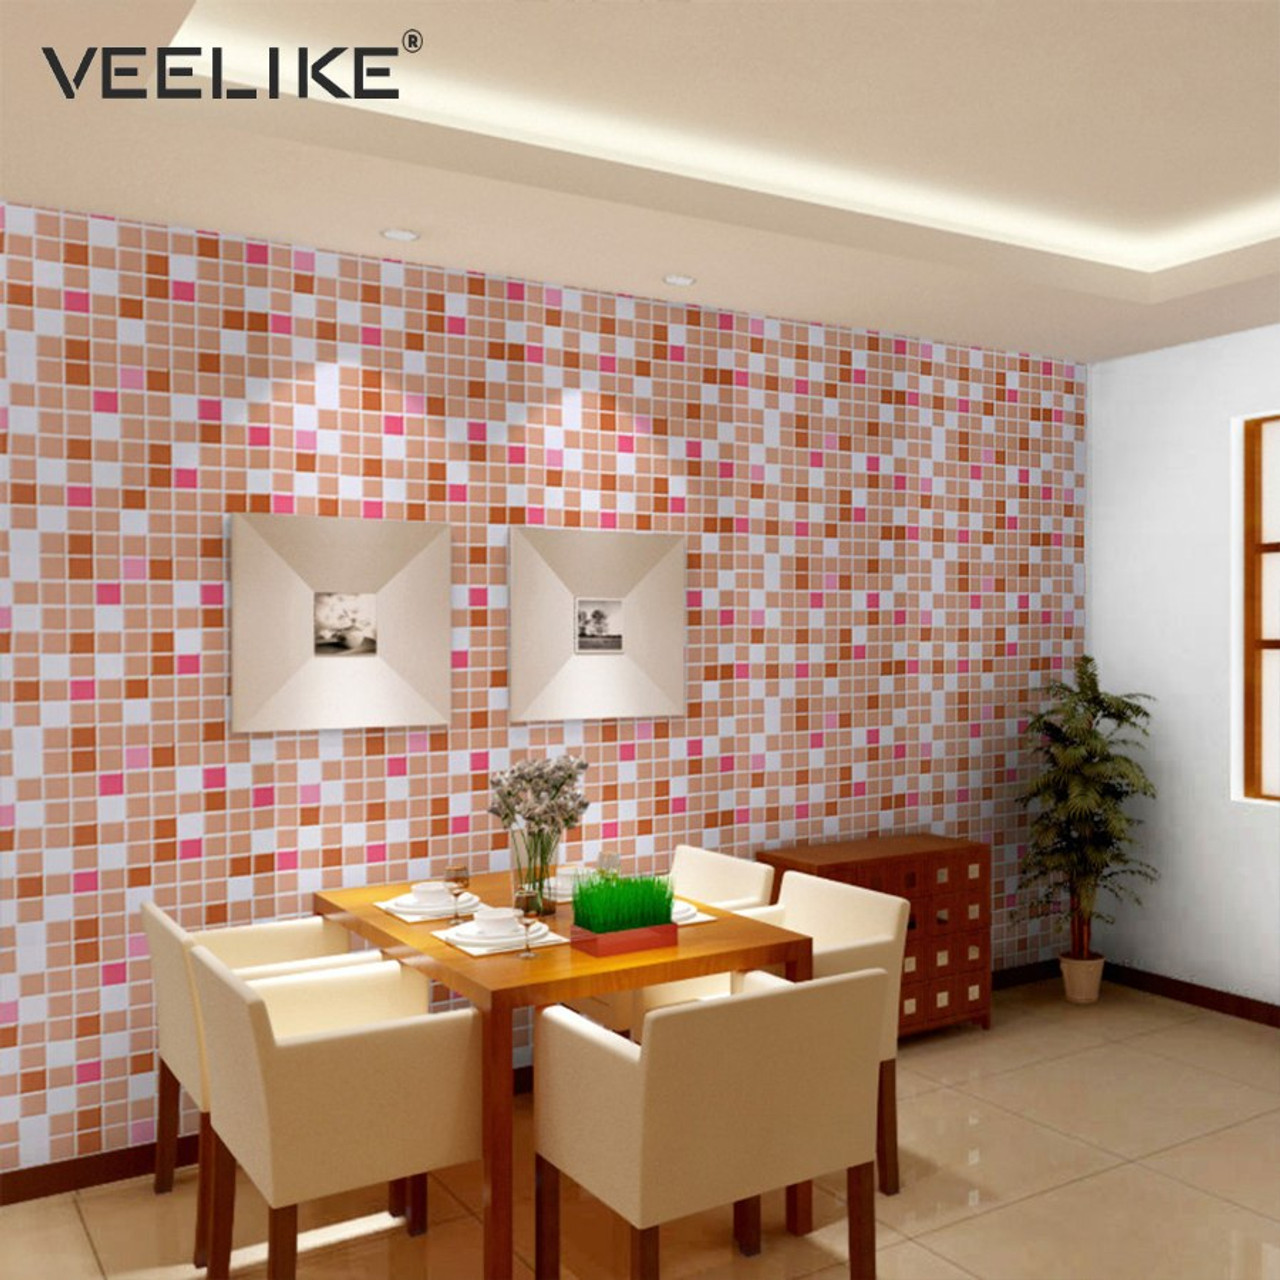 Bathroom Vinyl Pvc Self Adhesive Wallpaper For Kitchen Backsplash Tiles Sticker Contact Paper Waterproof Home Decor Wall Papers Onshopdeals Com